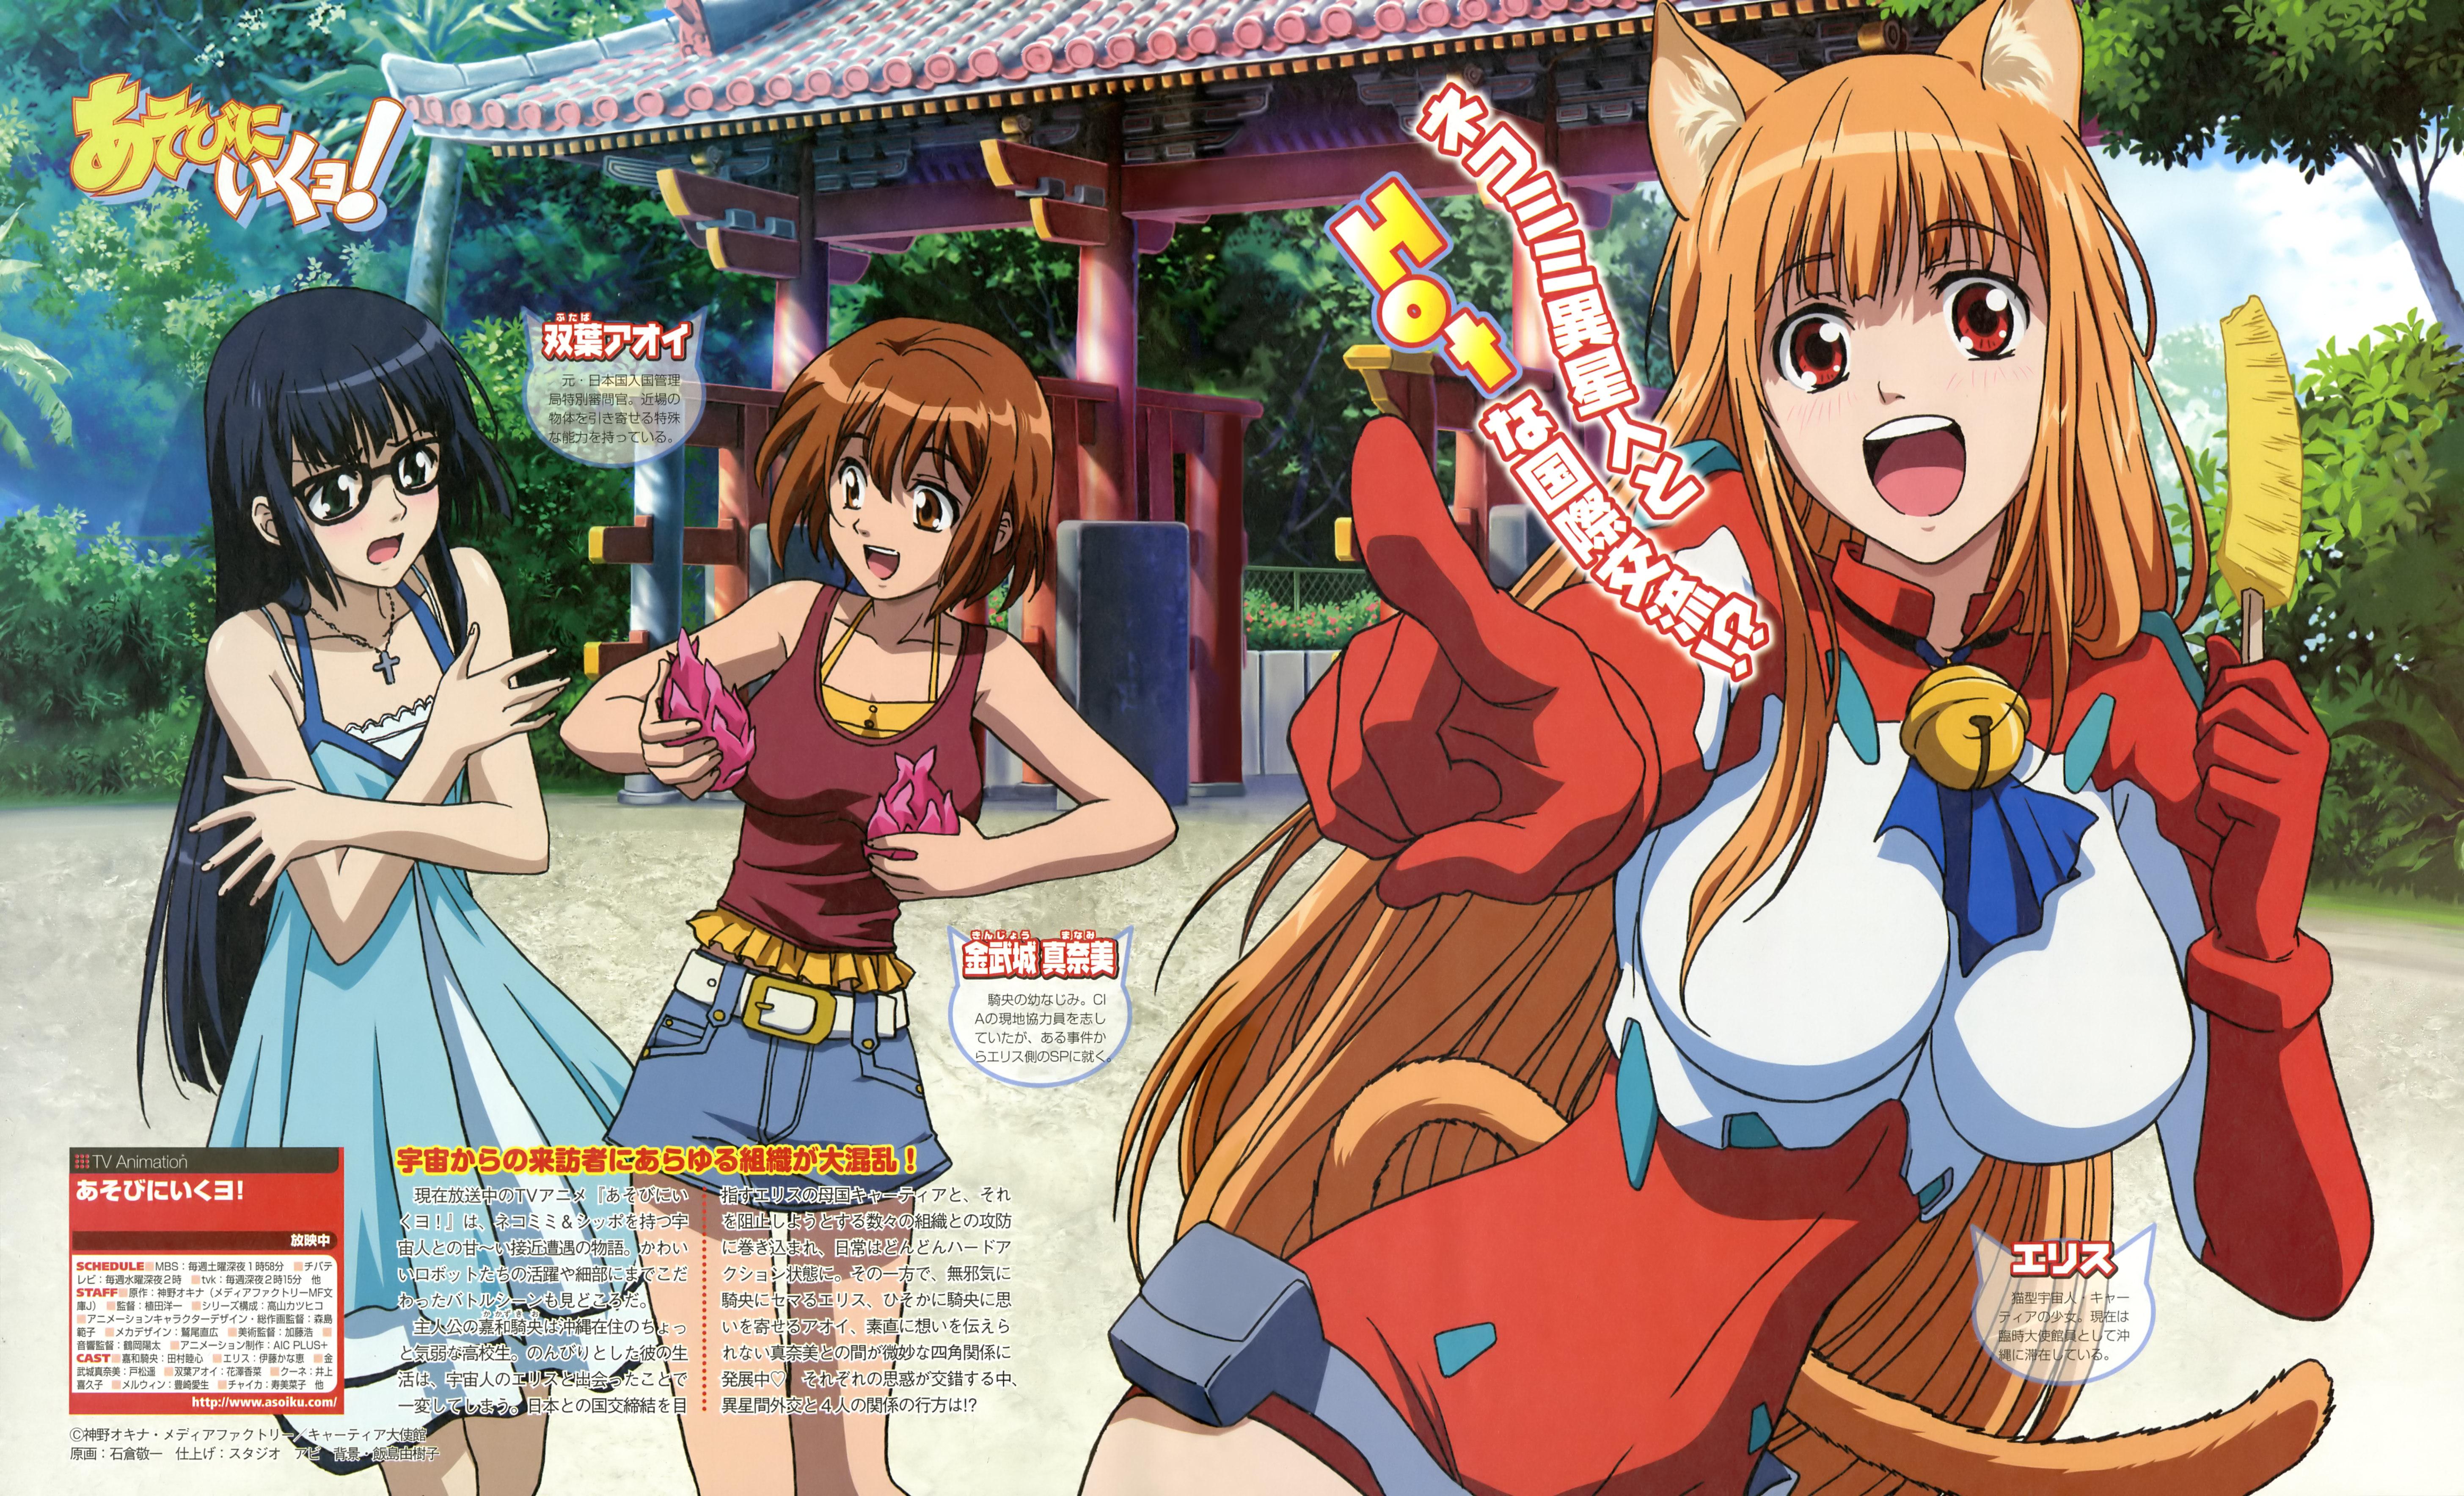 Asobi Ni Iku Yo Wallpaper 273210 Zerochan Anime Image Board